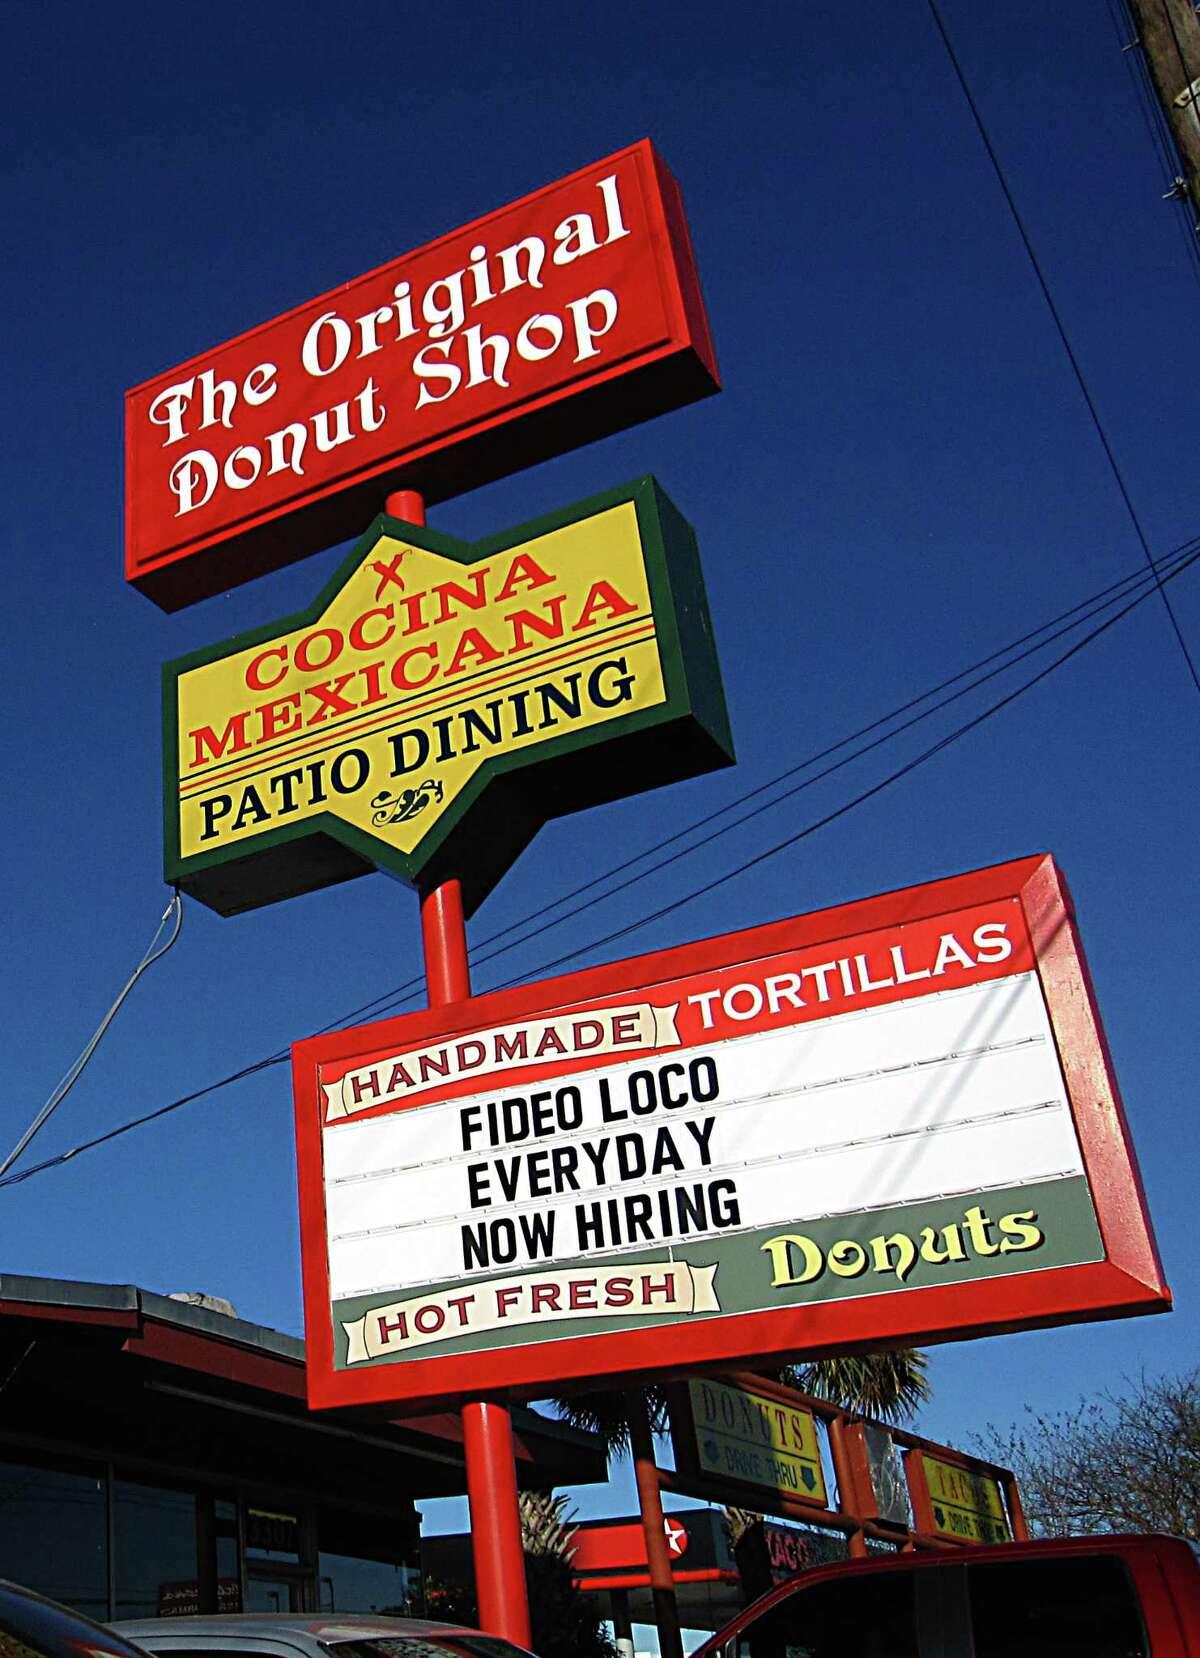 The Original Donut Shop on Fredericksburg Road.